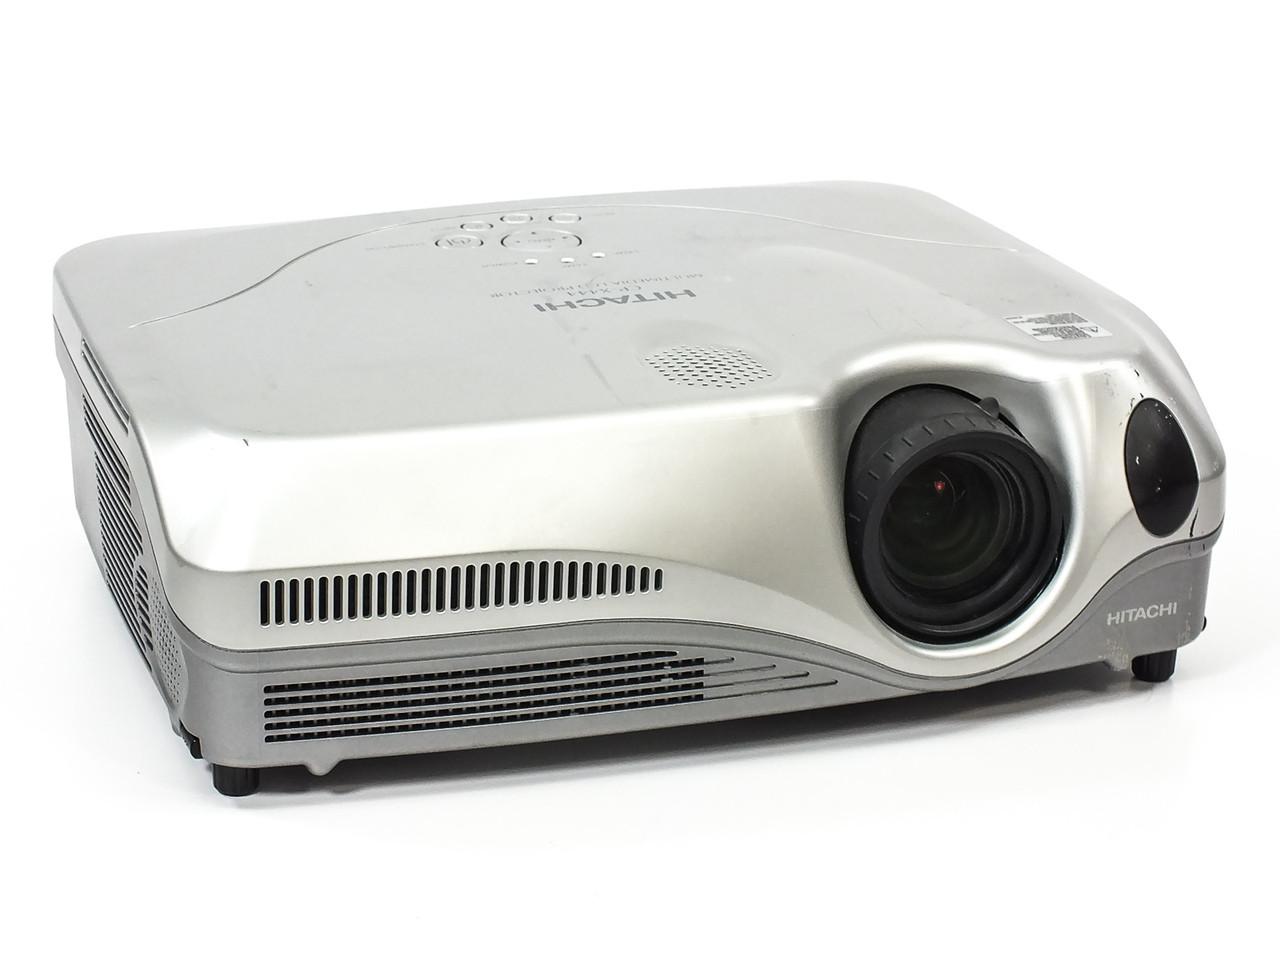 Hitachi Lcd Projector Cp Wx5505 5200 Lumen Wxga Ex302 Digital Multimedia 1024 X 768 3200 Lumens 500